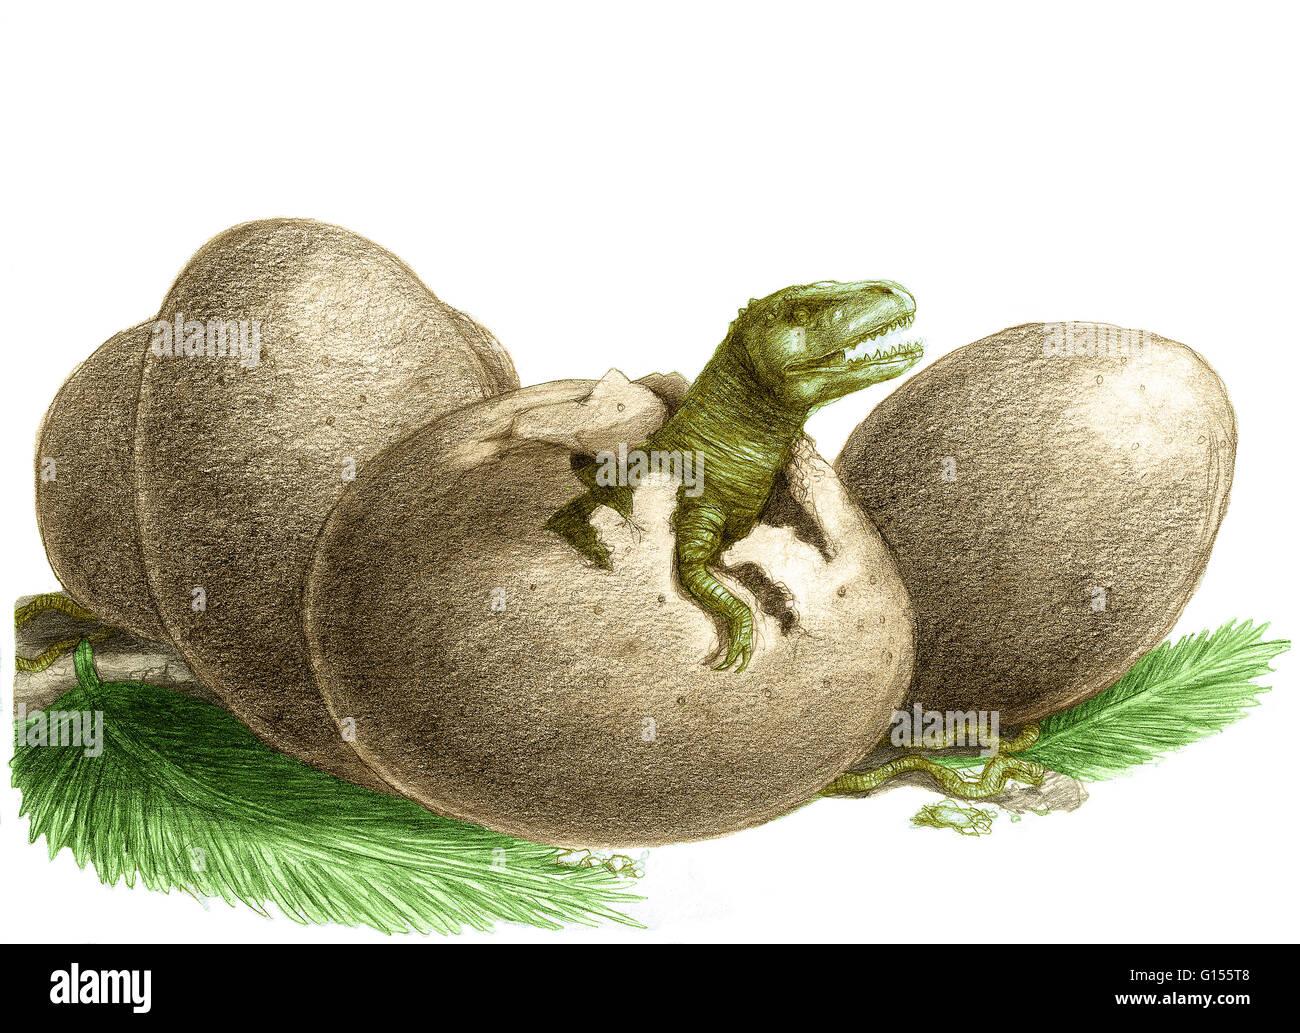 Color enhanced illustration of dinosaur egg hatching. - Stock Image